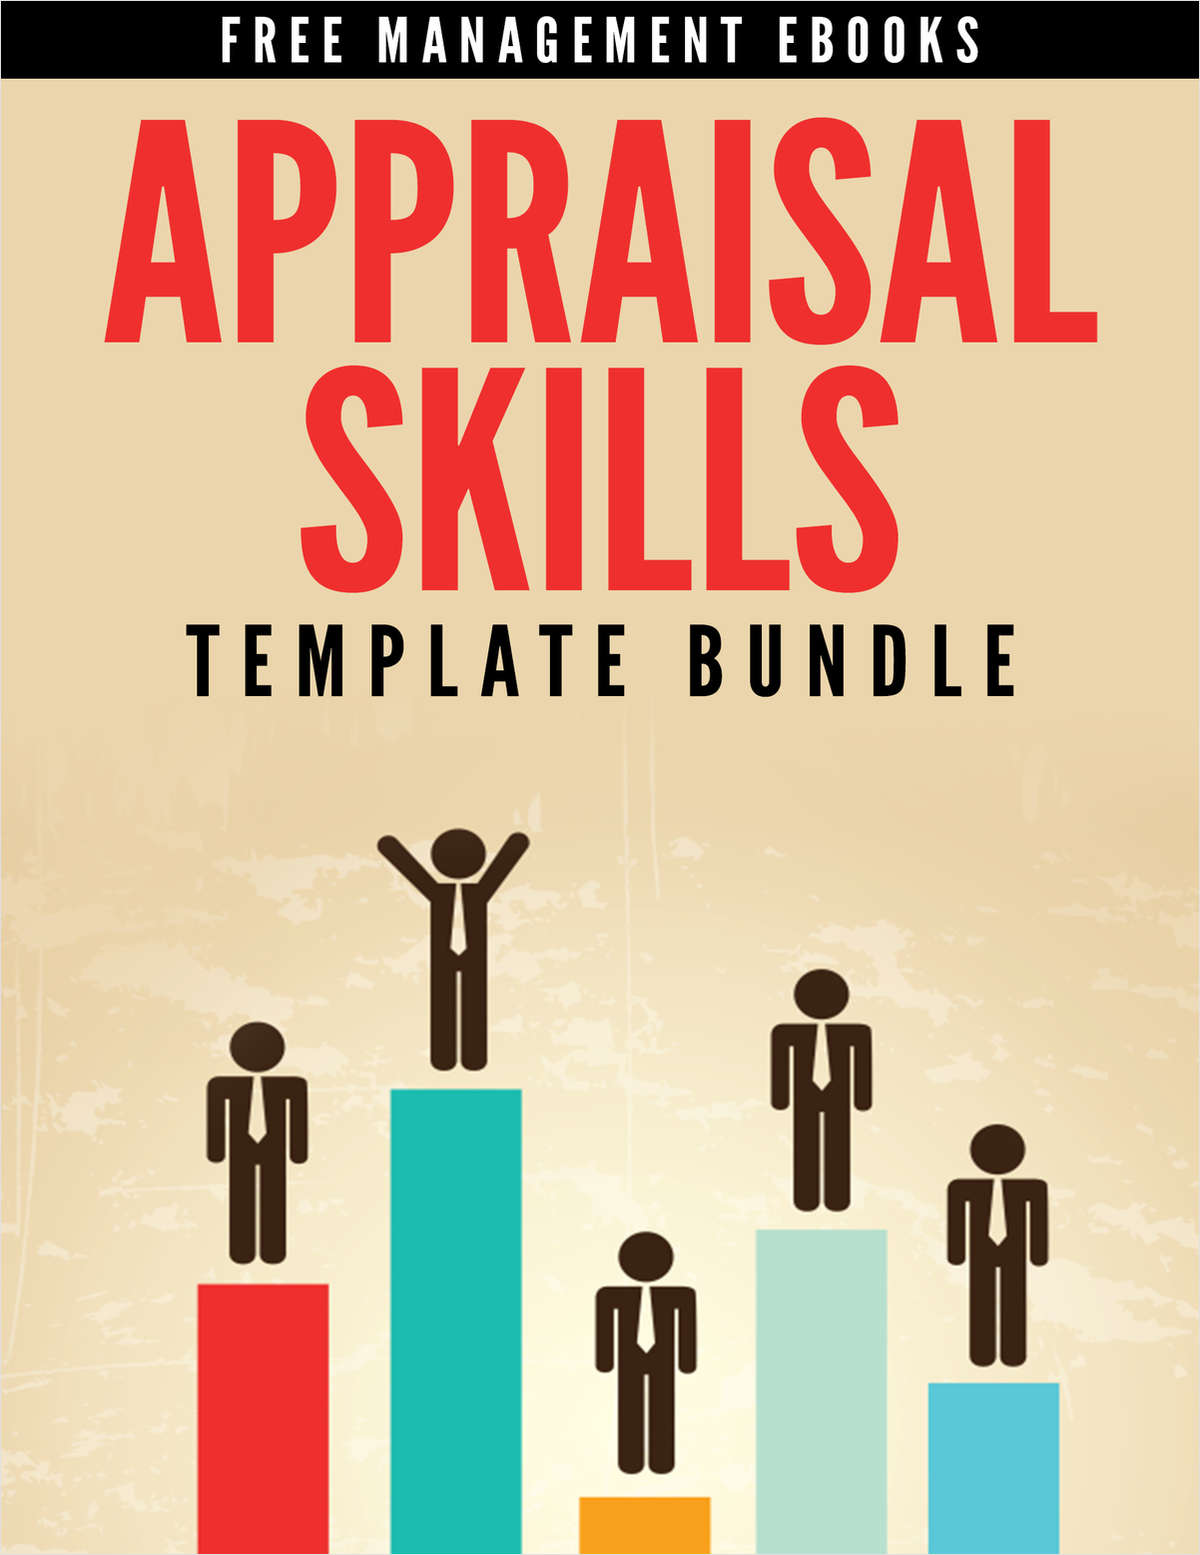 Appraisal Skills Template Bundle